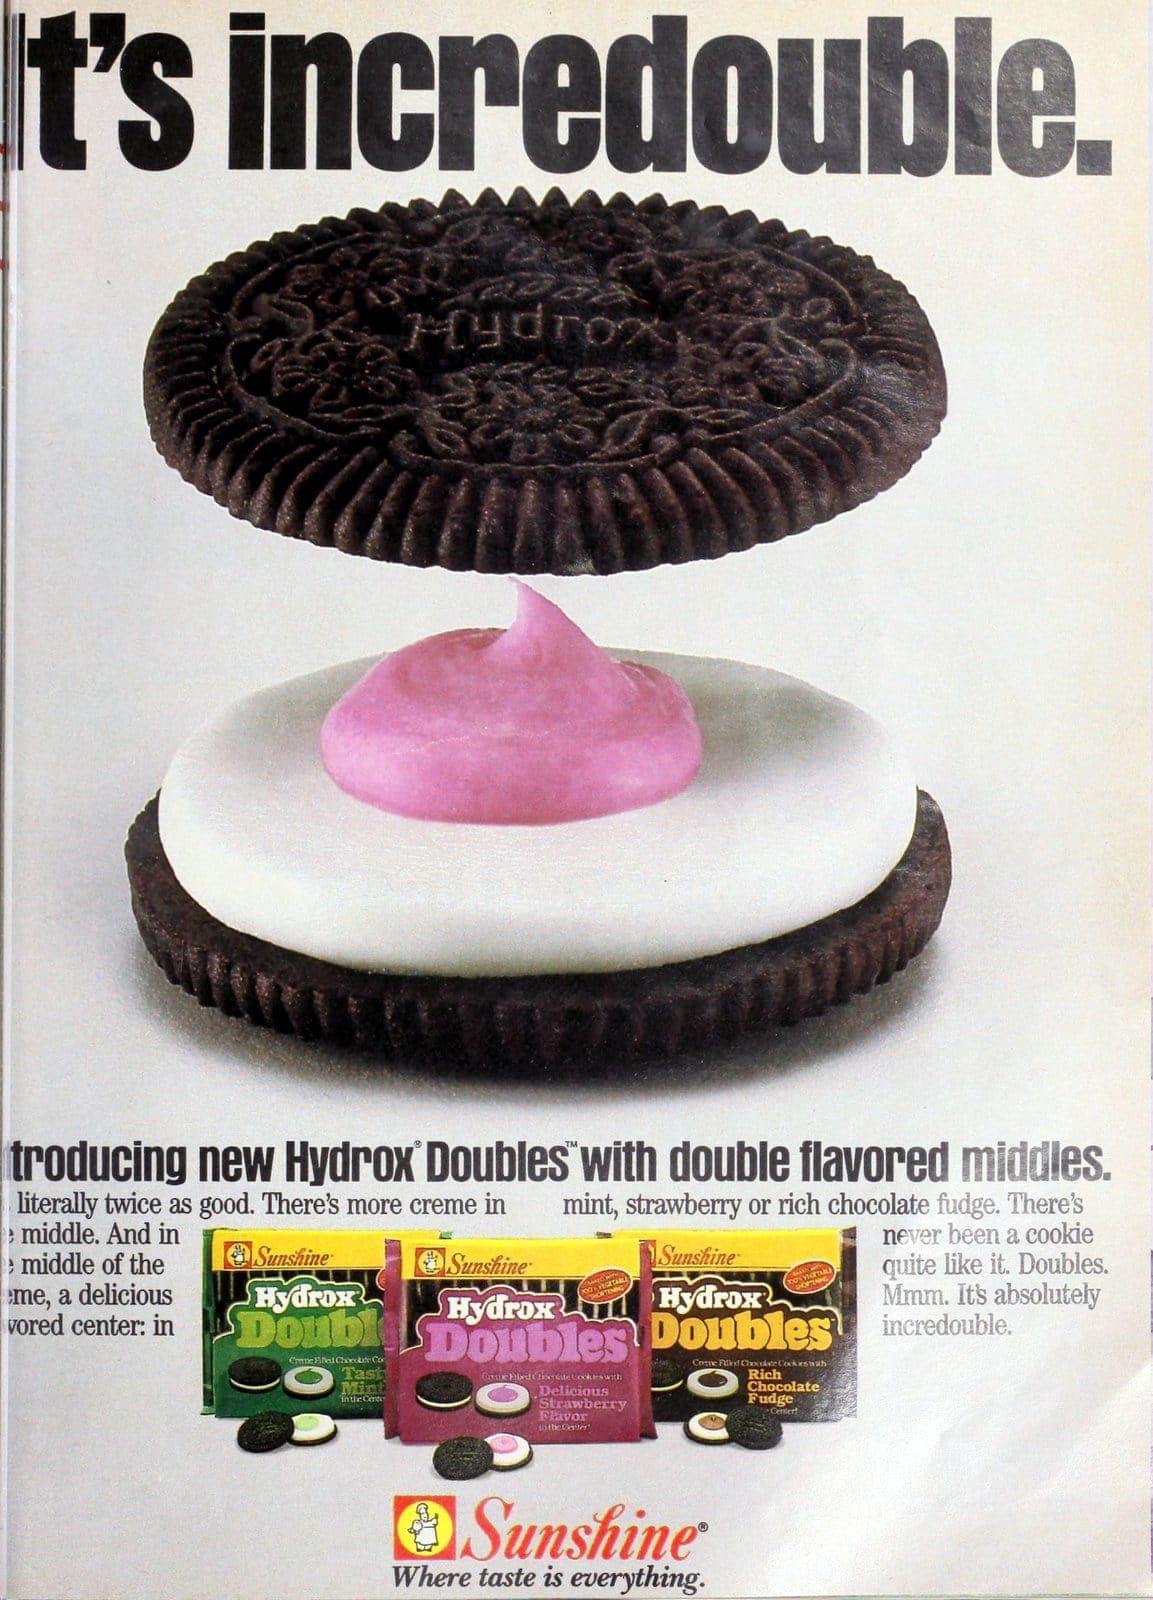 Hydrox Doubles cookies (1986)